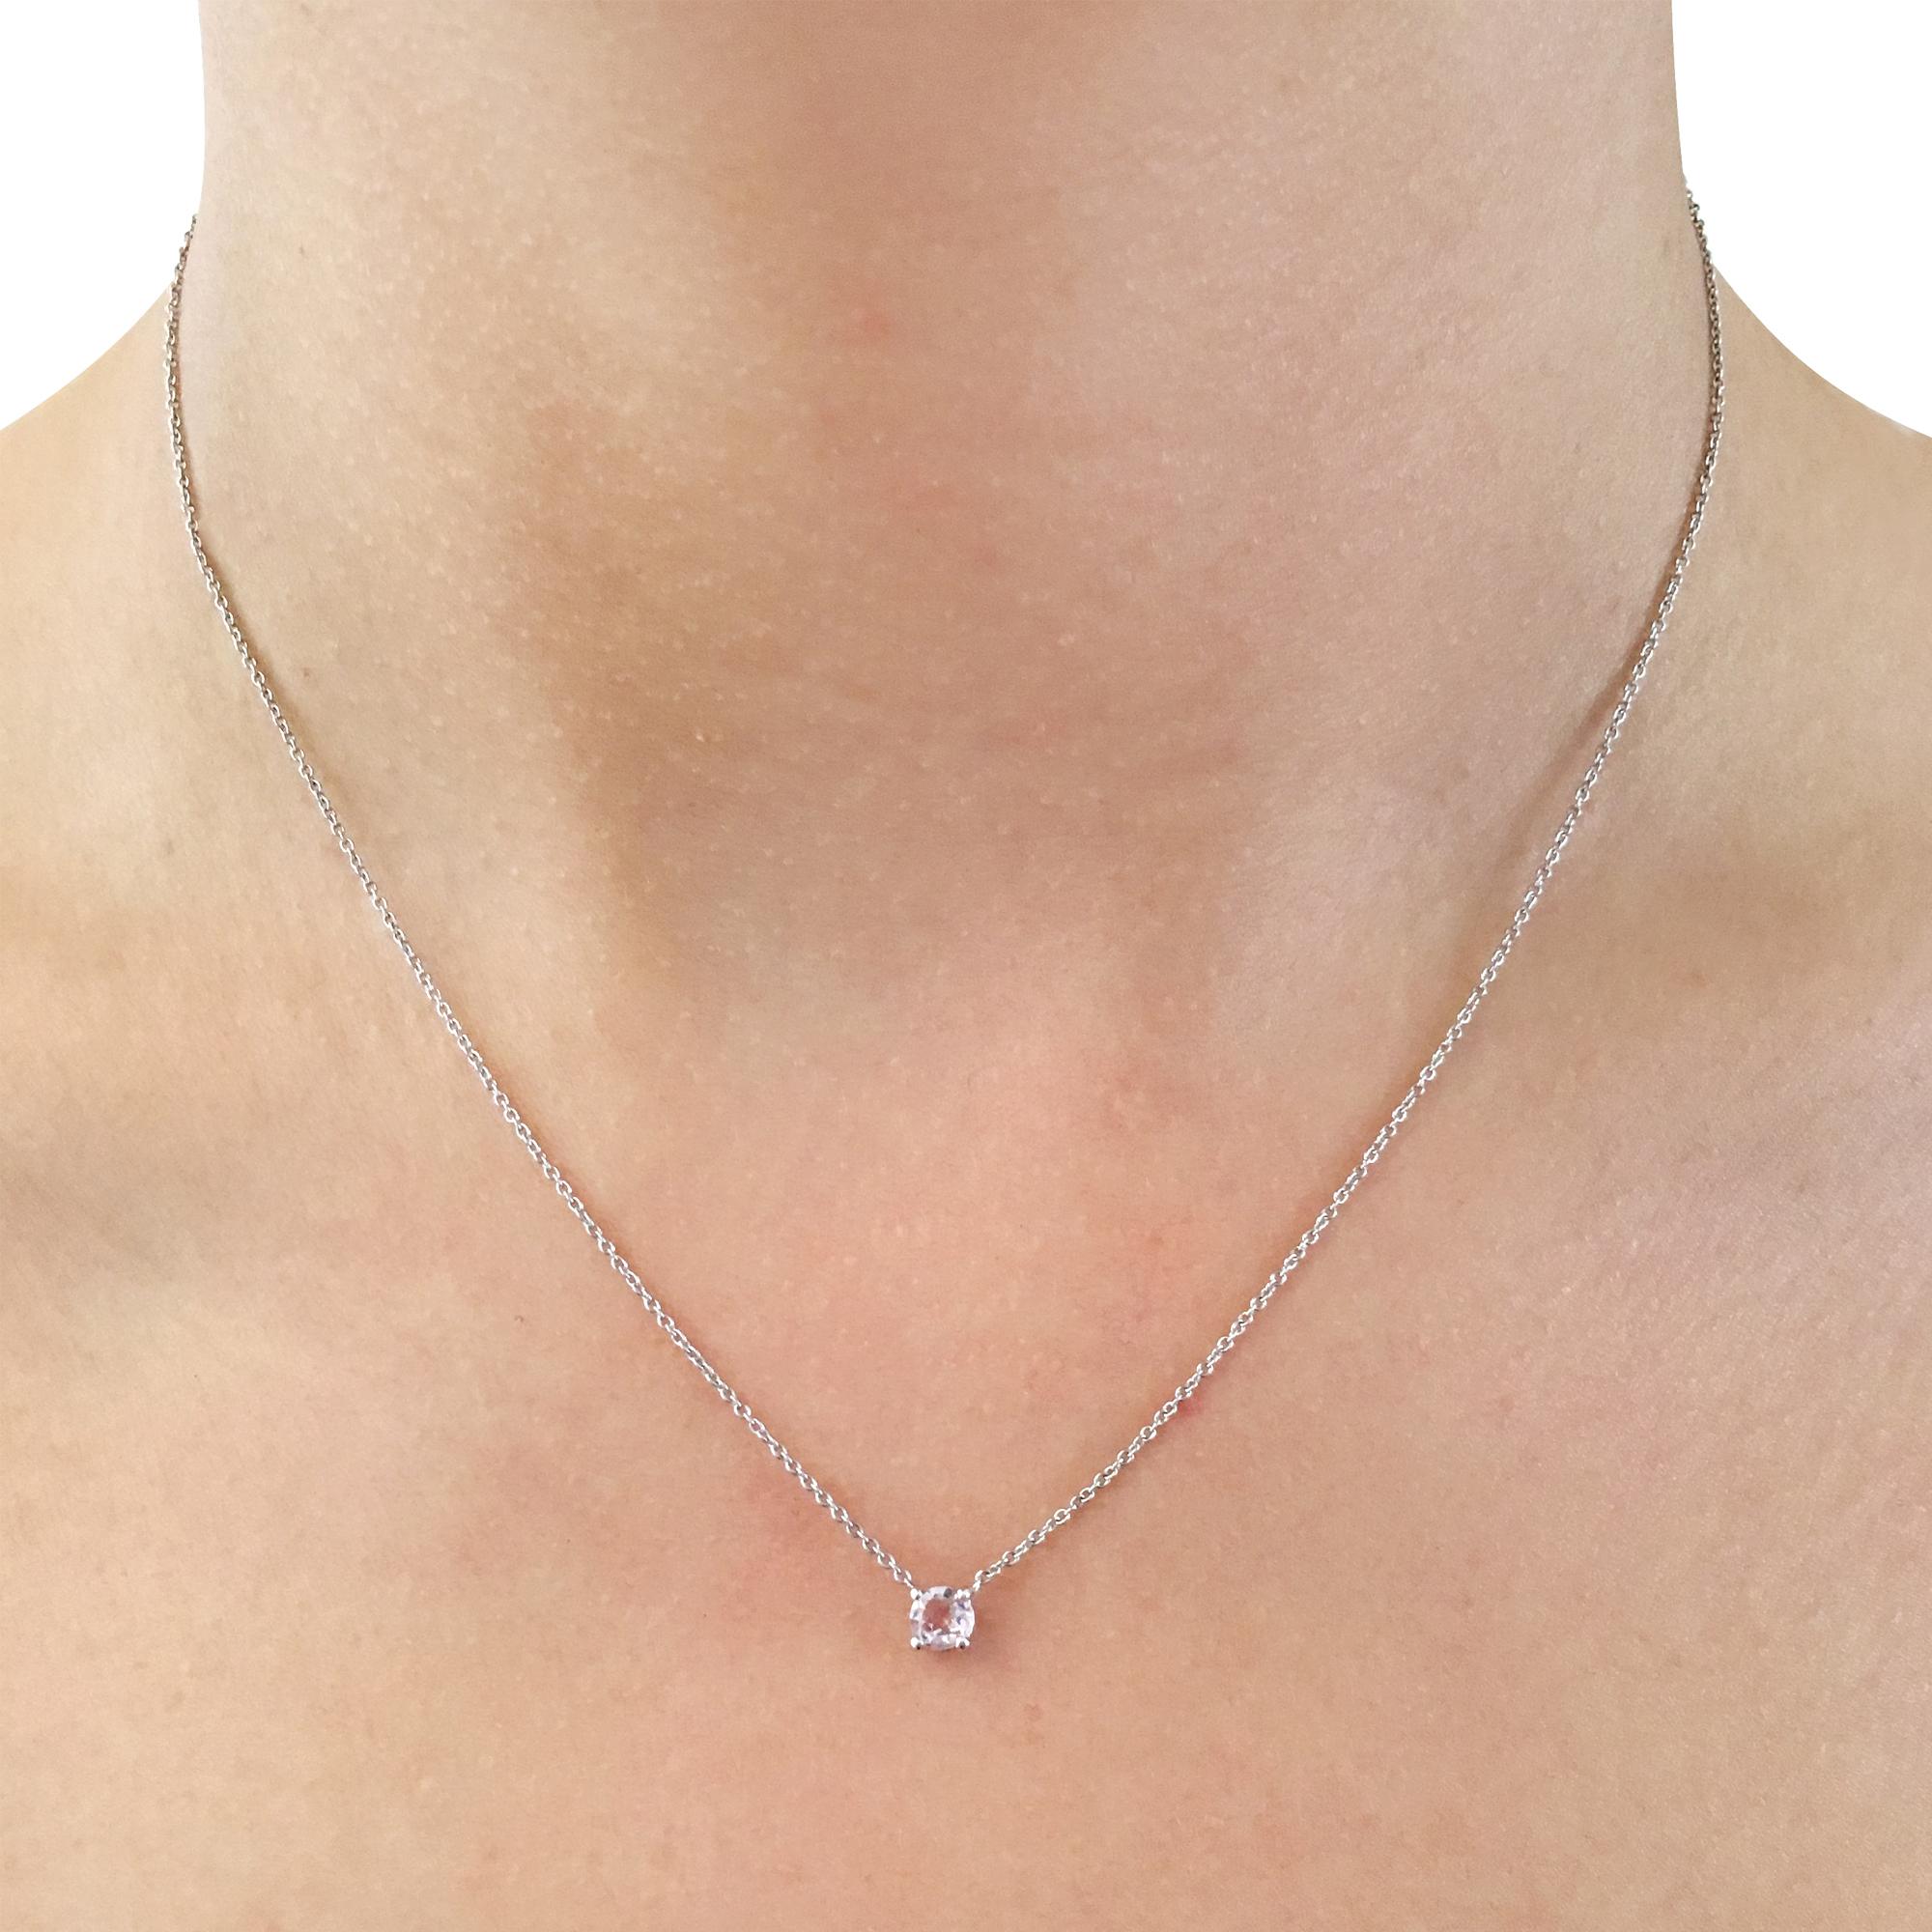 morganite-18ct-white-gold-necklace.jpg